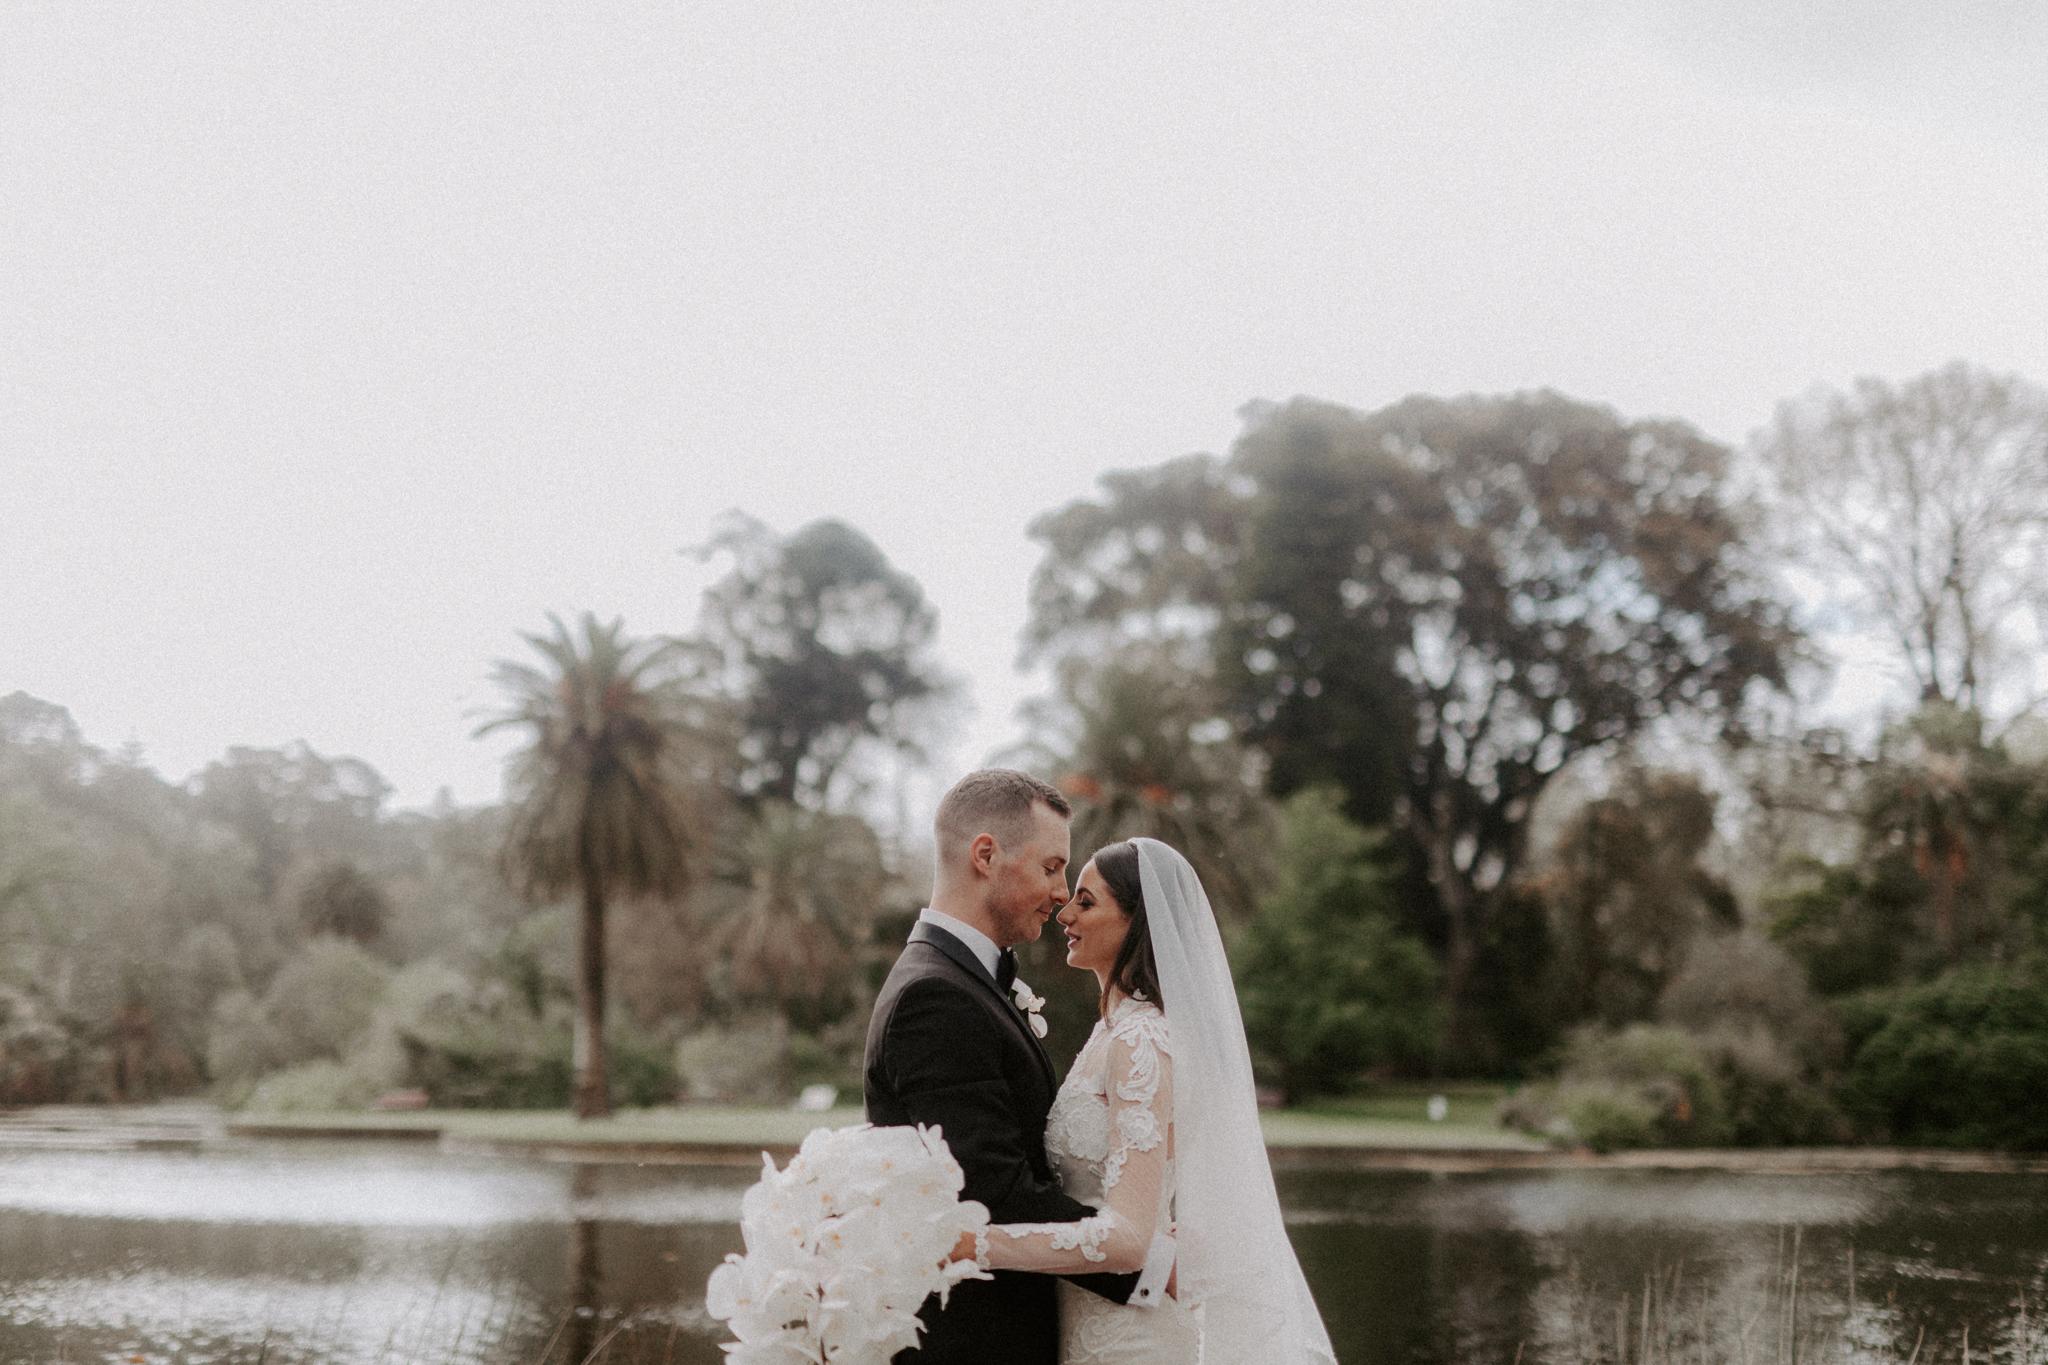 The-Terrace-Royal-Botanic-Gardens-Wedding-Emotions-and-Math-Photography-090.jpg